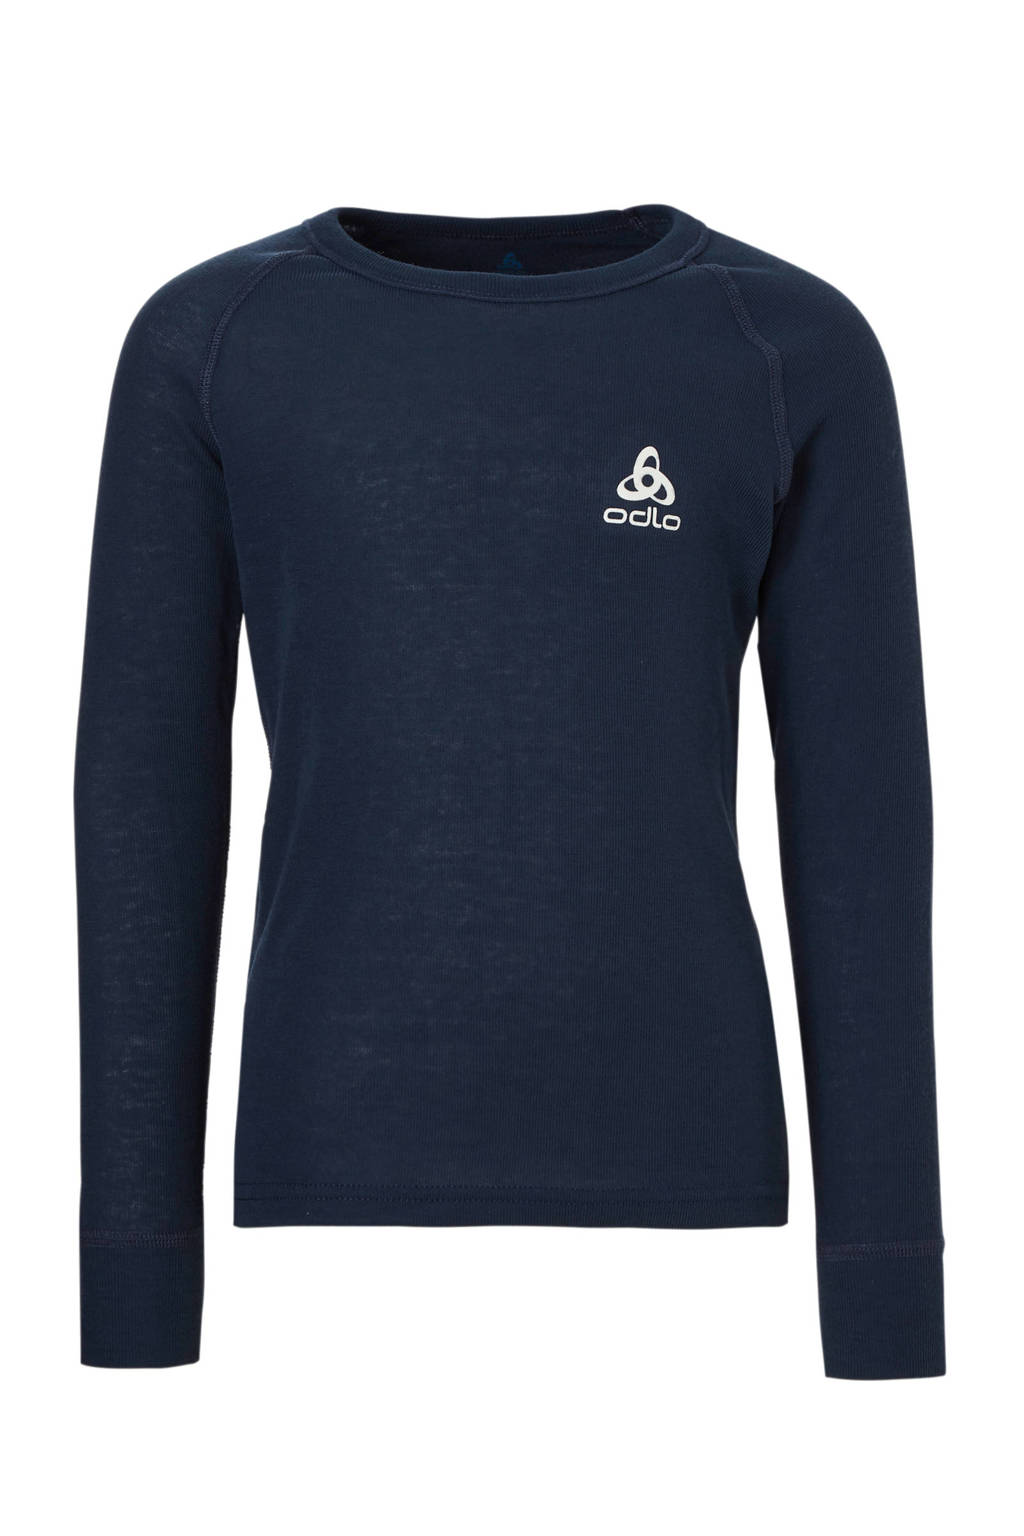 Odlo thermo sport T-shirt donkerblauw, Donkerblauw